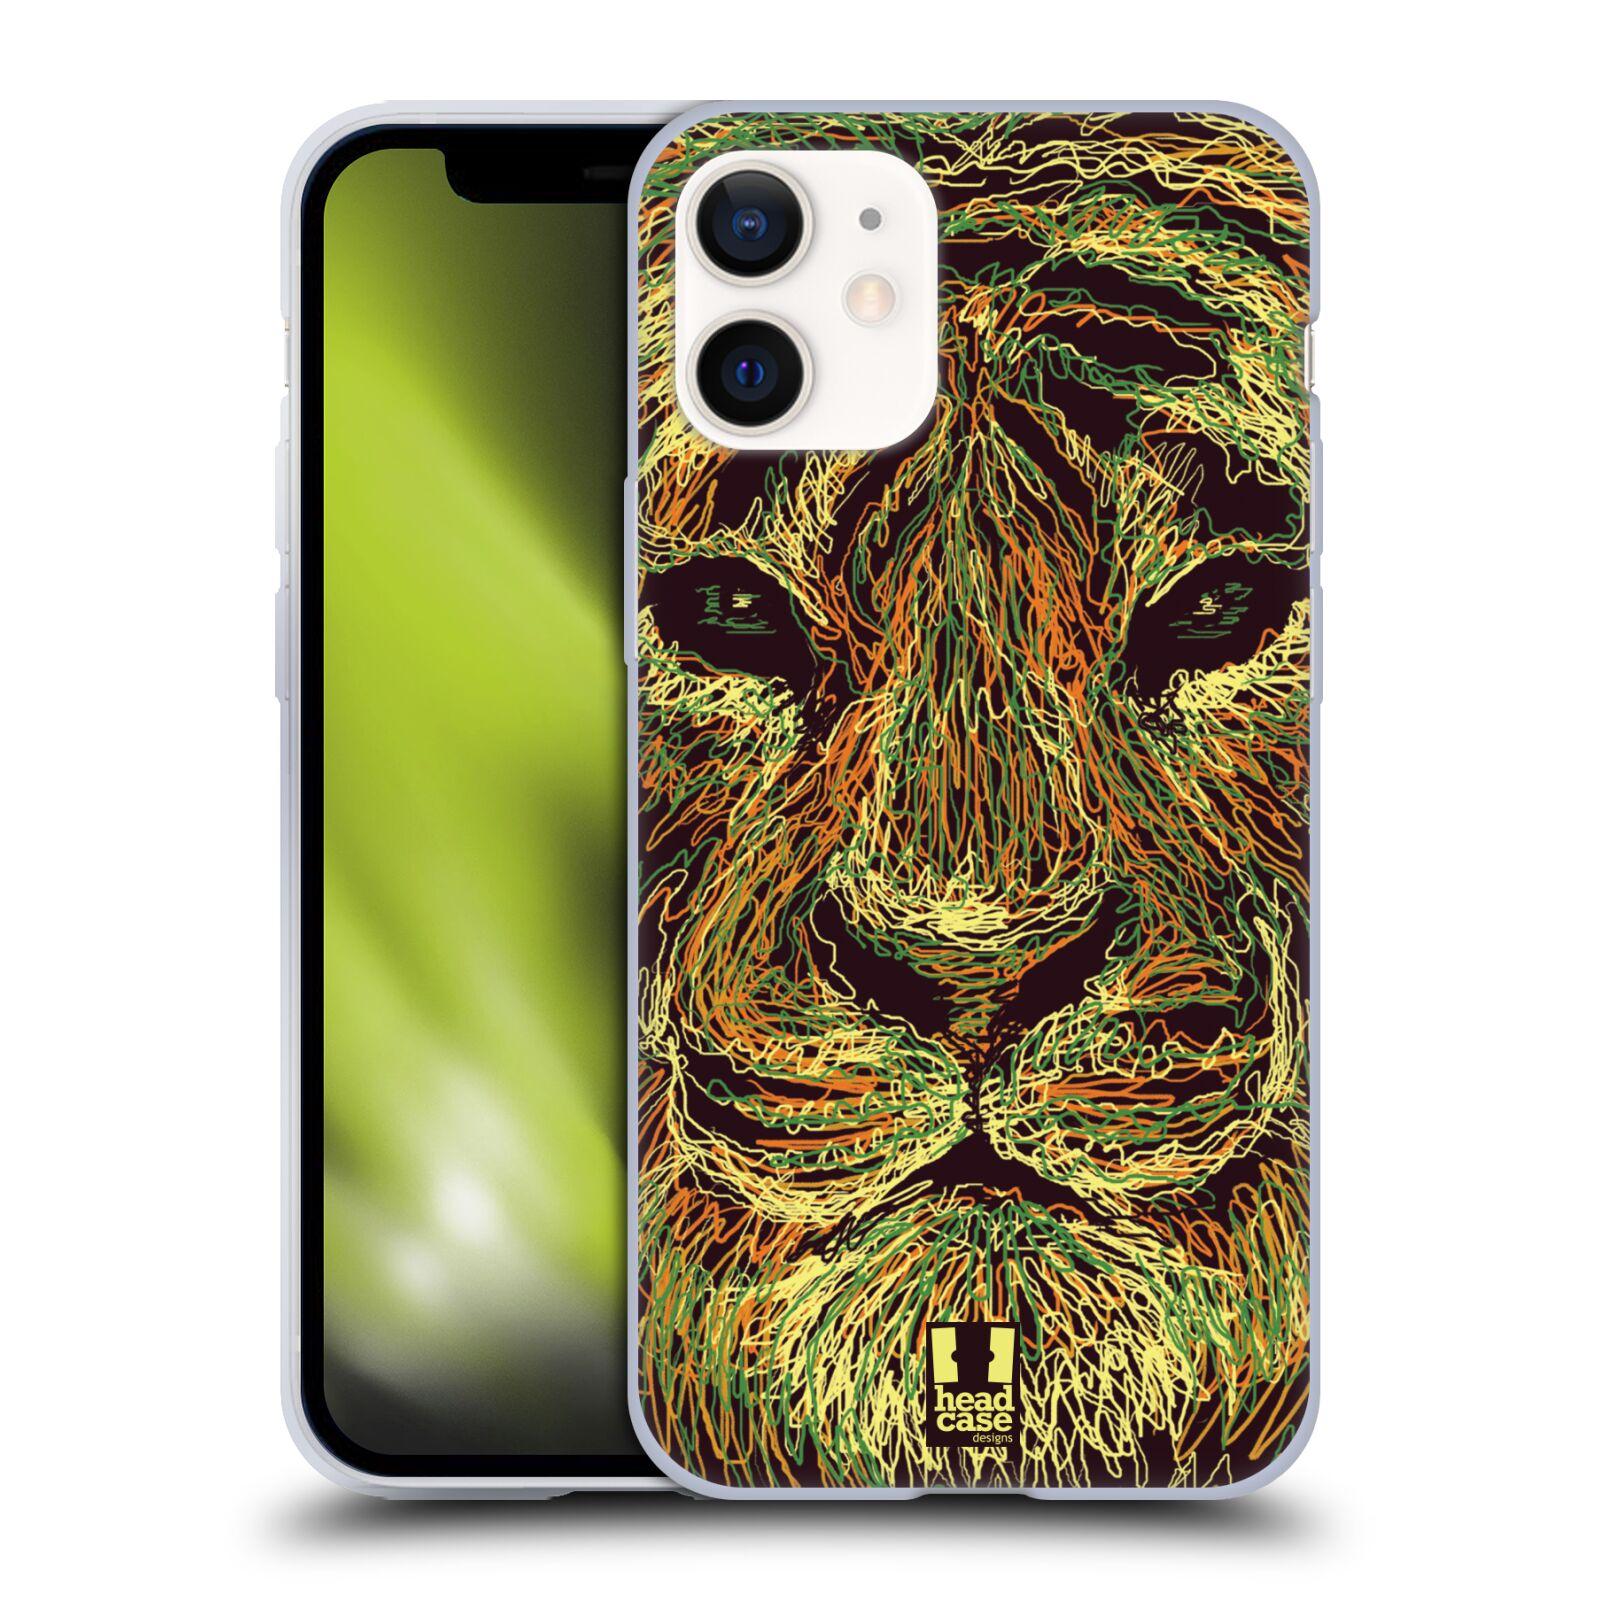 Plastový obal na mobil Apple Iphone 12 MINI vzor zvíře čmáranice tygr